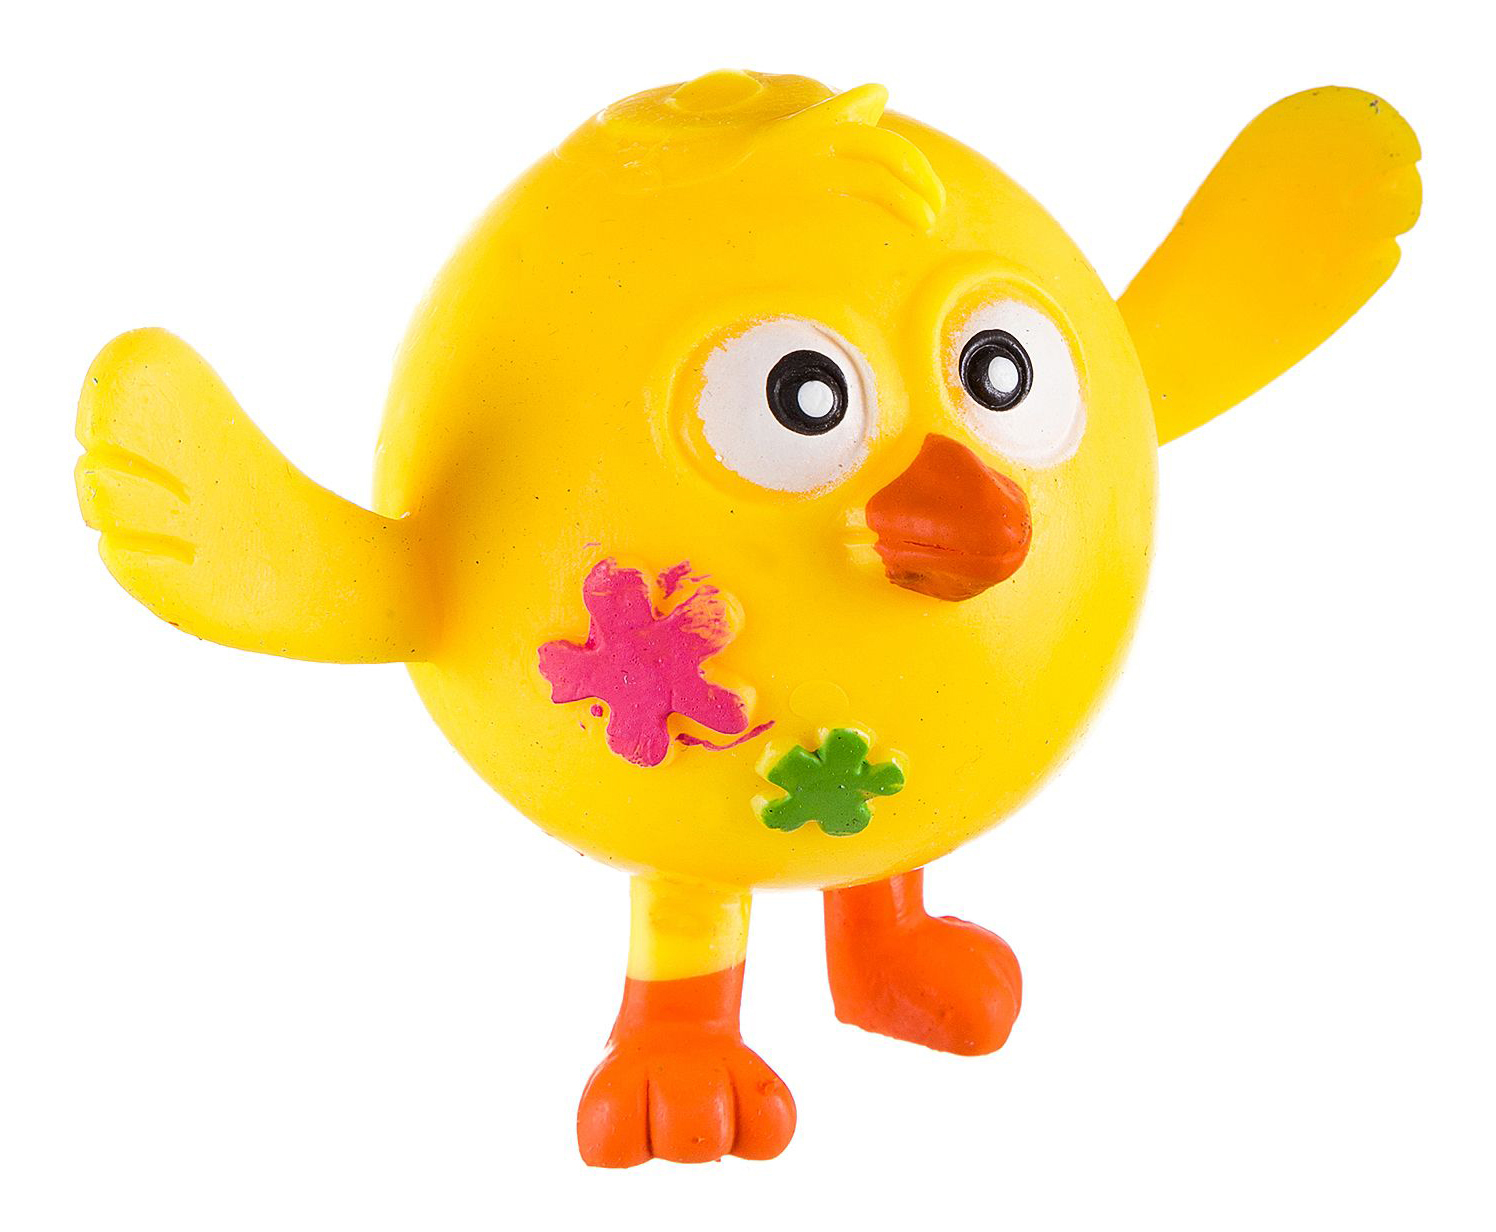 Купить Жамкарик цыпленок, Игрушка-антистресс Жамкарик Цыпленок Bondibon вв2501, Мягкие игрушки антистресс